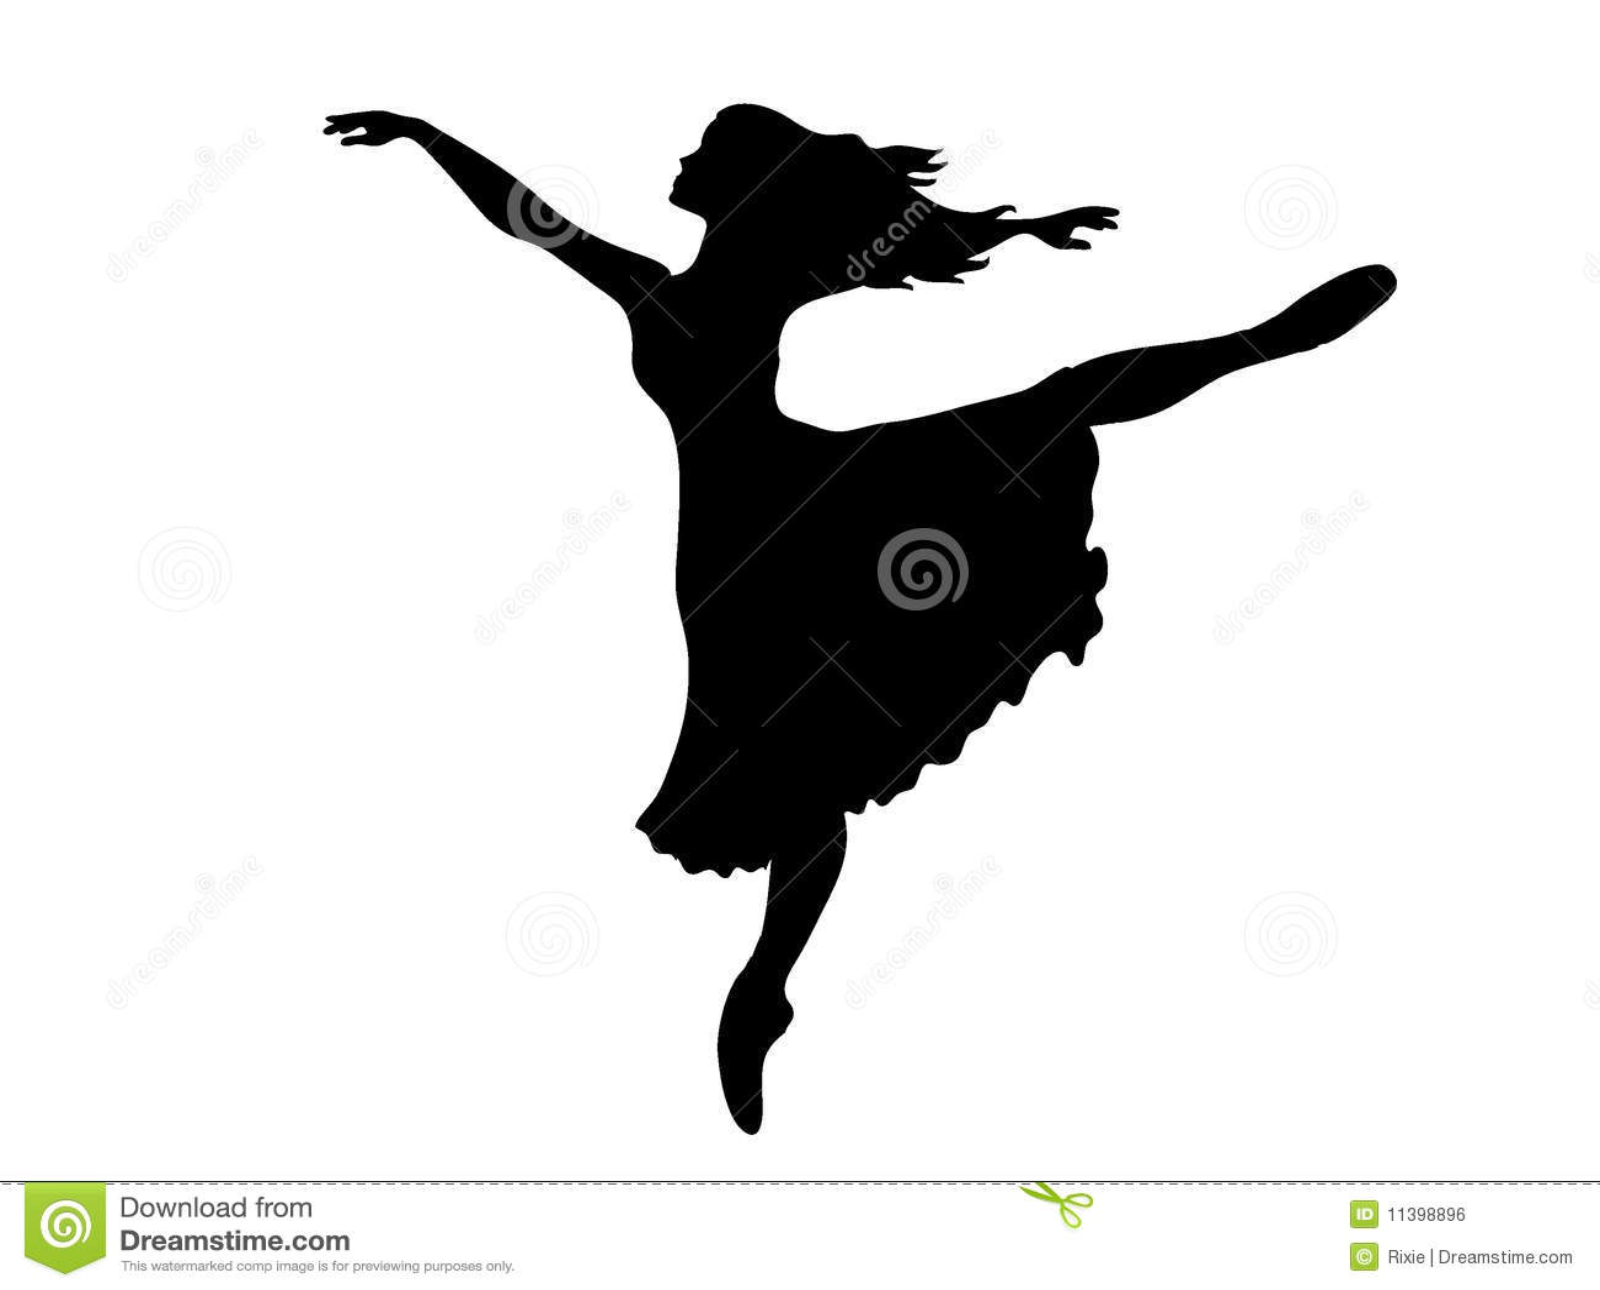 Ballerina Silhouette Stock Vector. Illustration Of